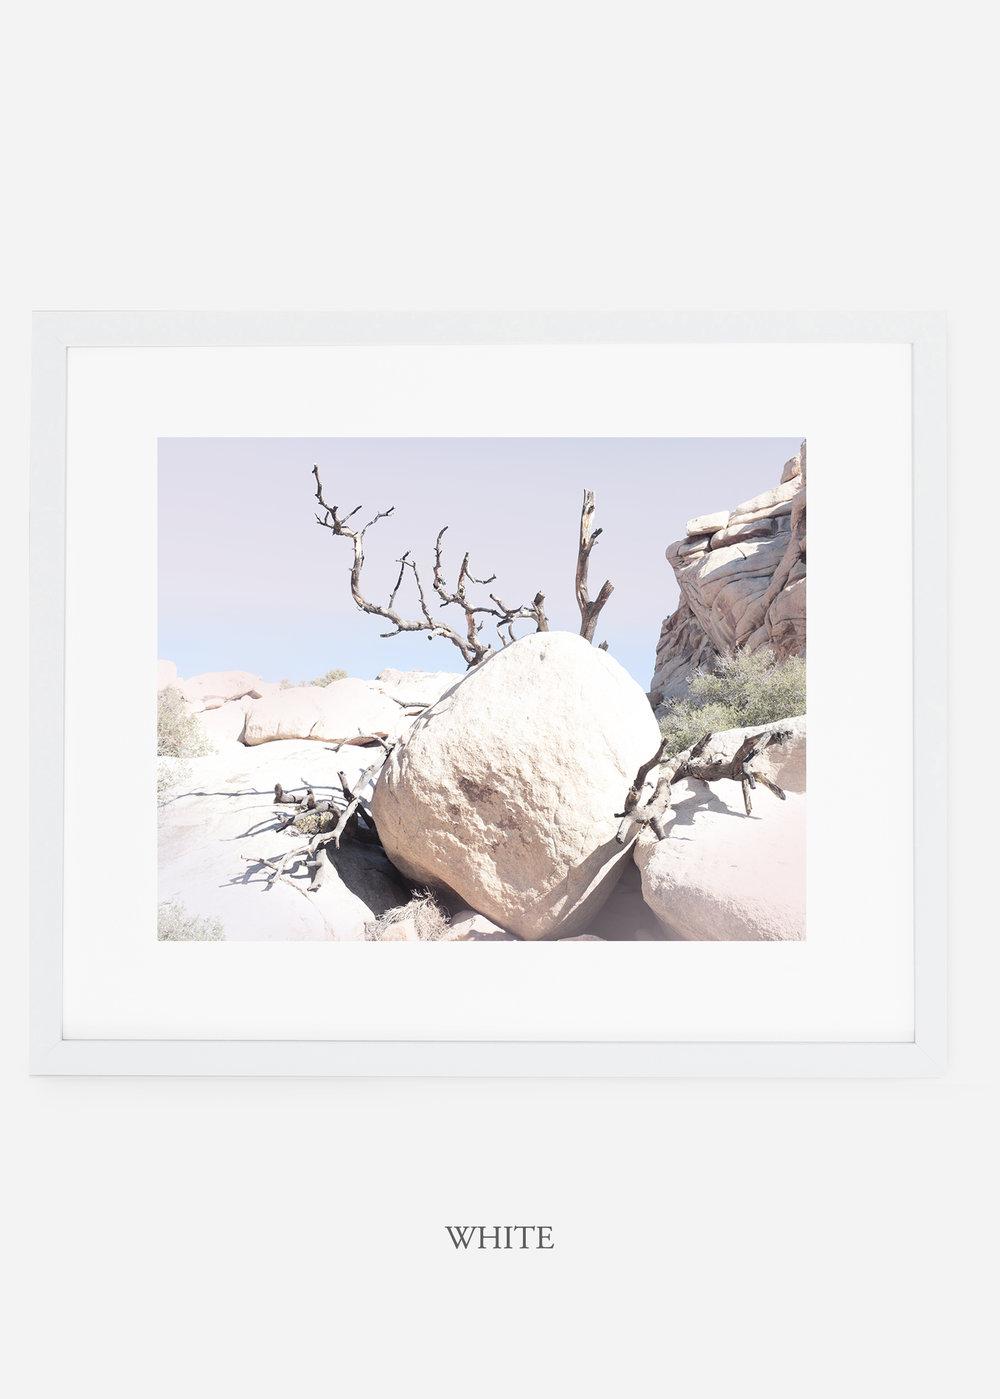 WilderCalifornia_whiteframe_JoshuaTree_No.17_interiordesign_prints_art.jpg